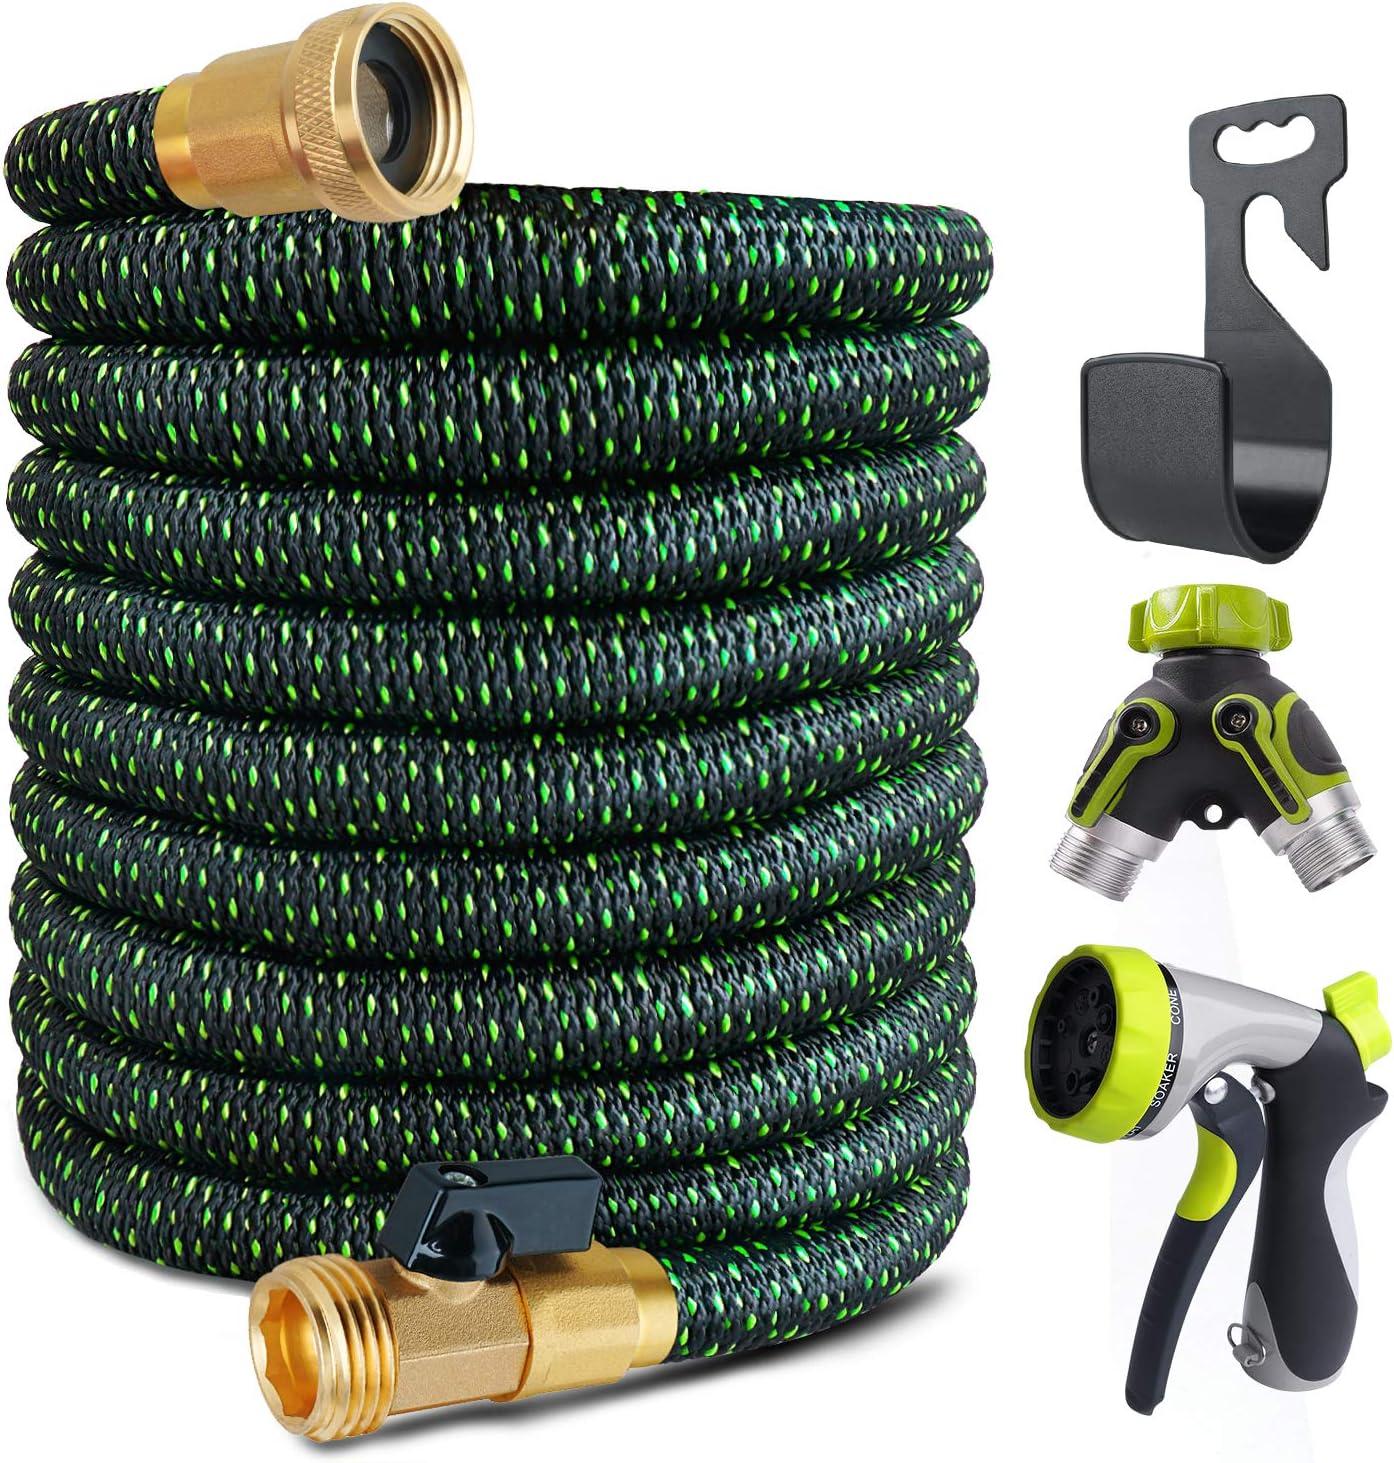 Garden Hose Expandable - Superior Strength 3750D / 4-Layers Latex/Extra-Strong Brass Connectors & Shut Off Valve - 8 Function Zinc Alloy Spray Nozzle/ 2-Way Pocket Flexible Splitter (50F-T)